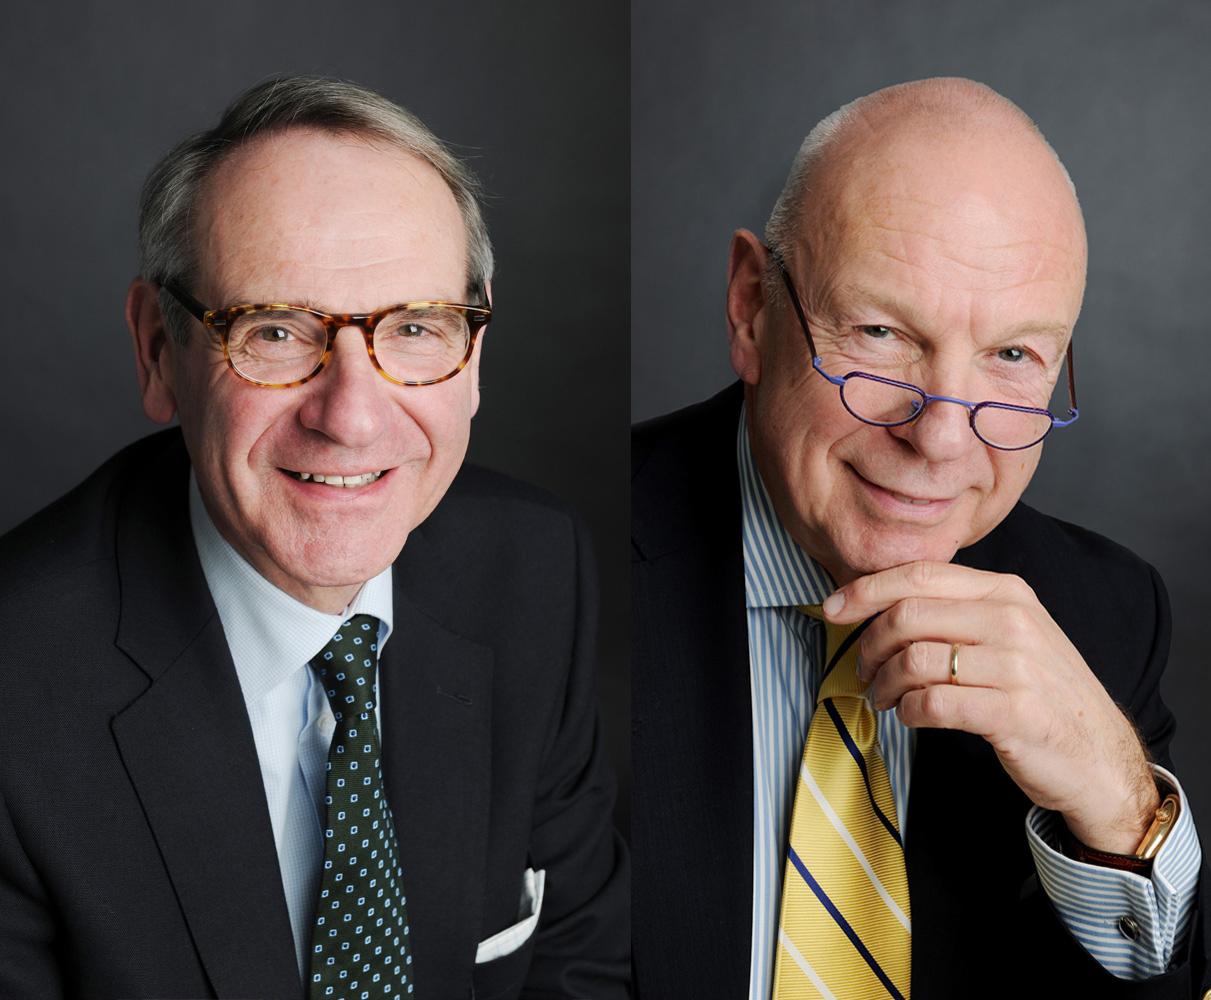 Wim en Guus Gerards